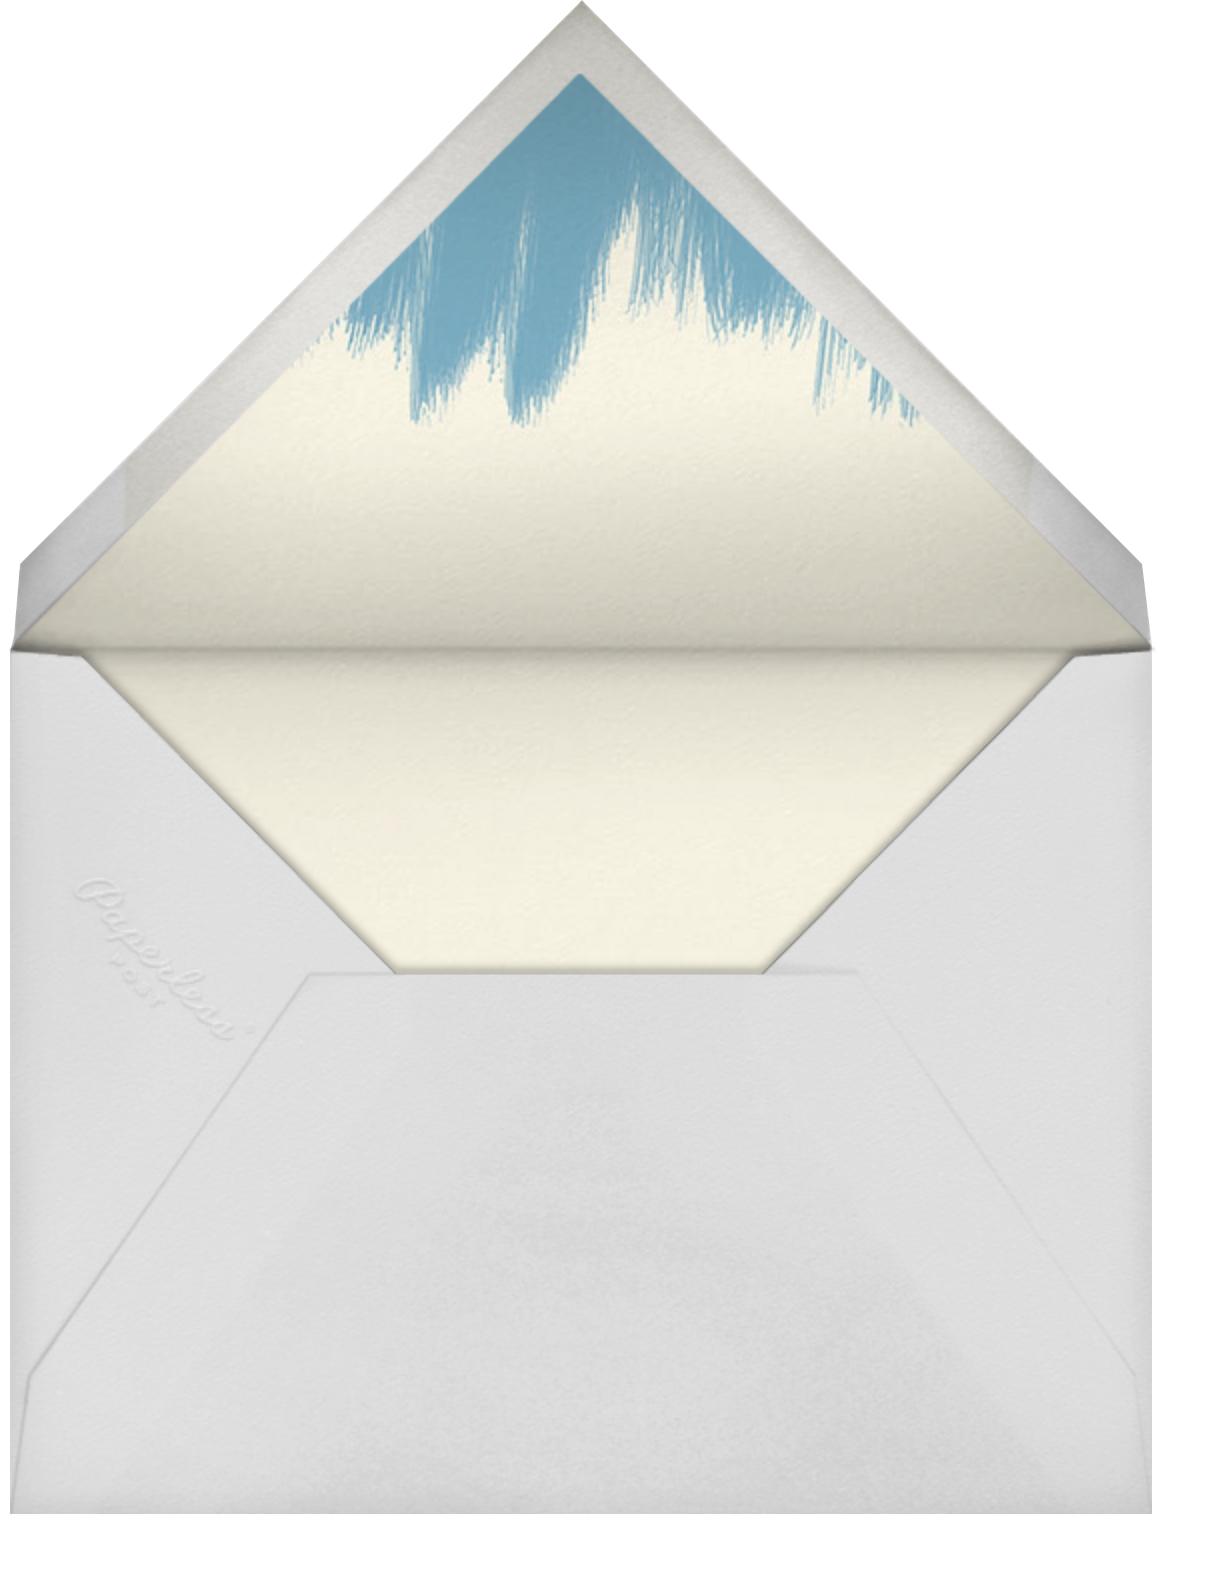 Abstract Rings - Ashley G - Brunch - envelope back